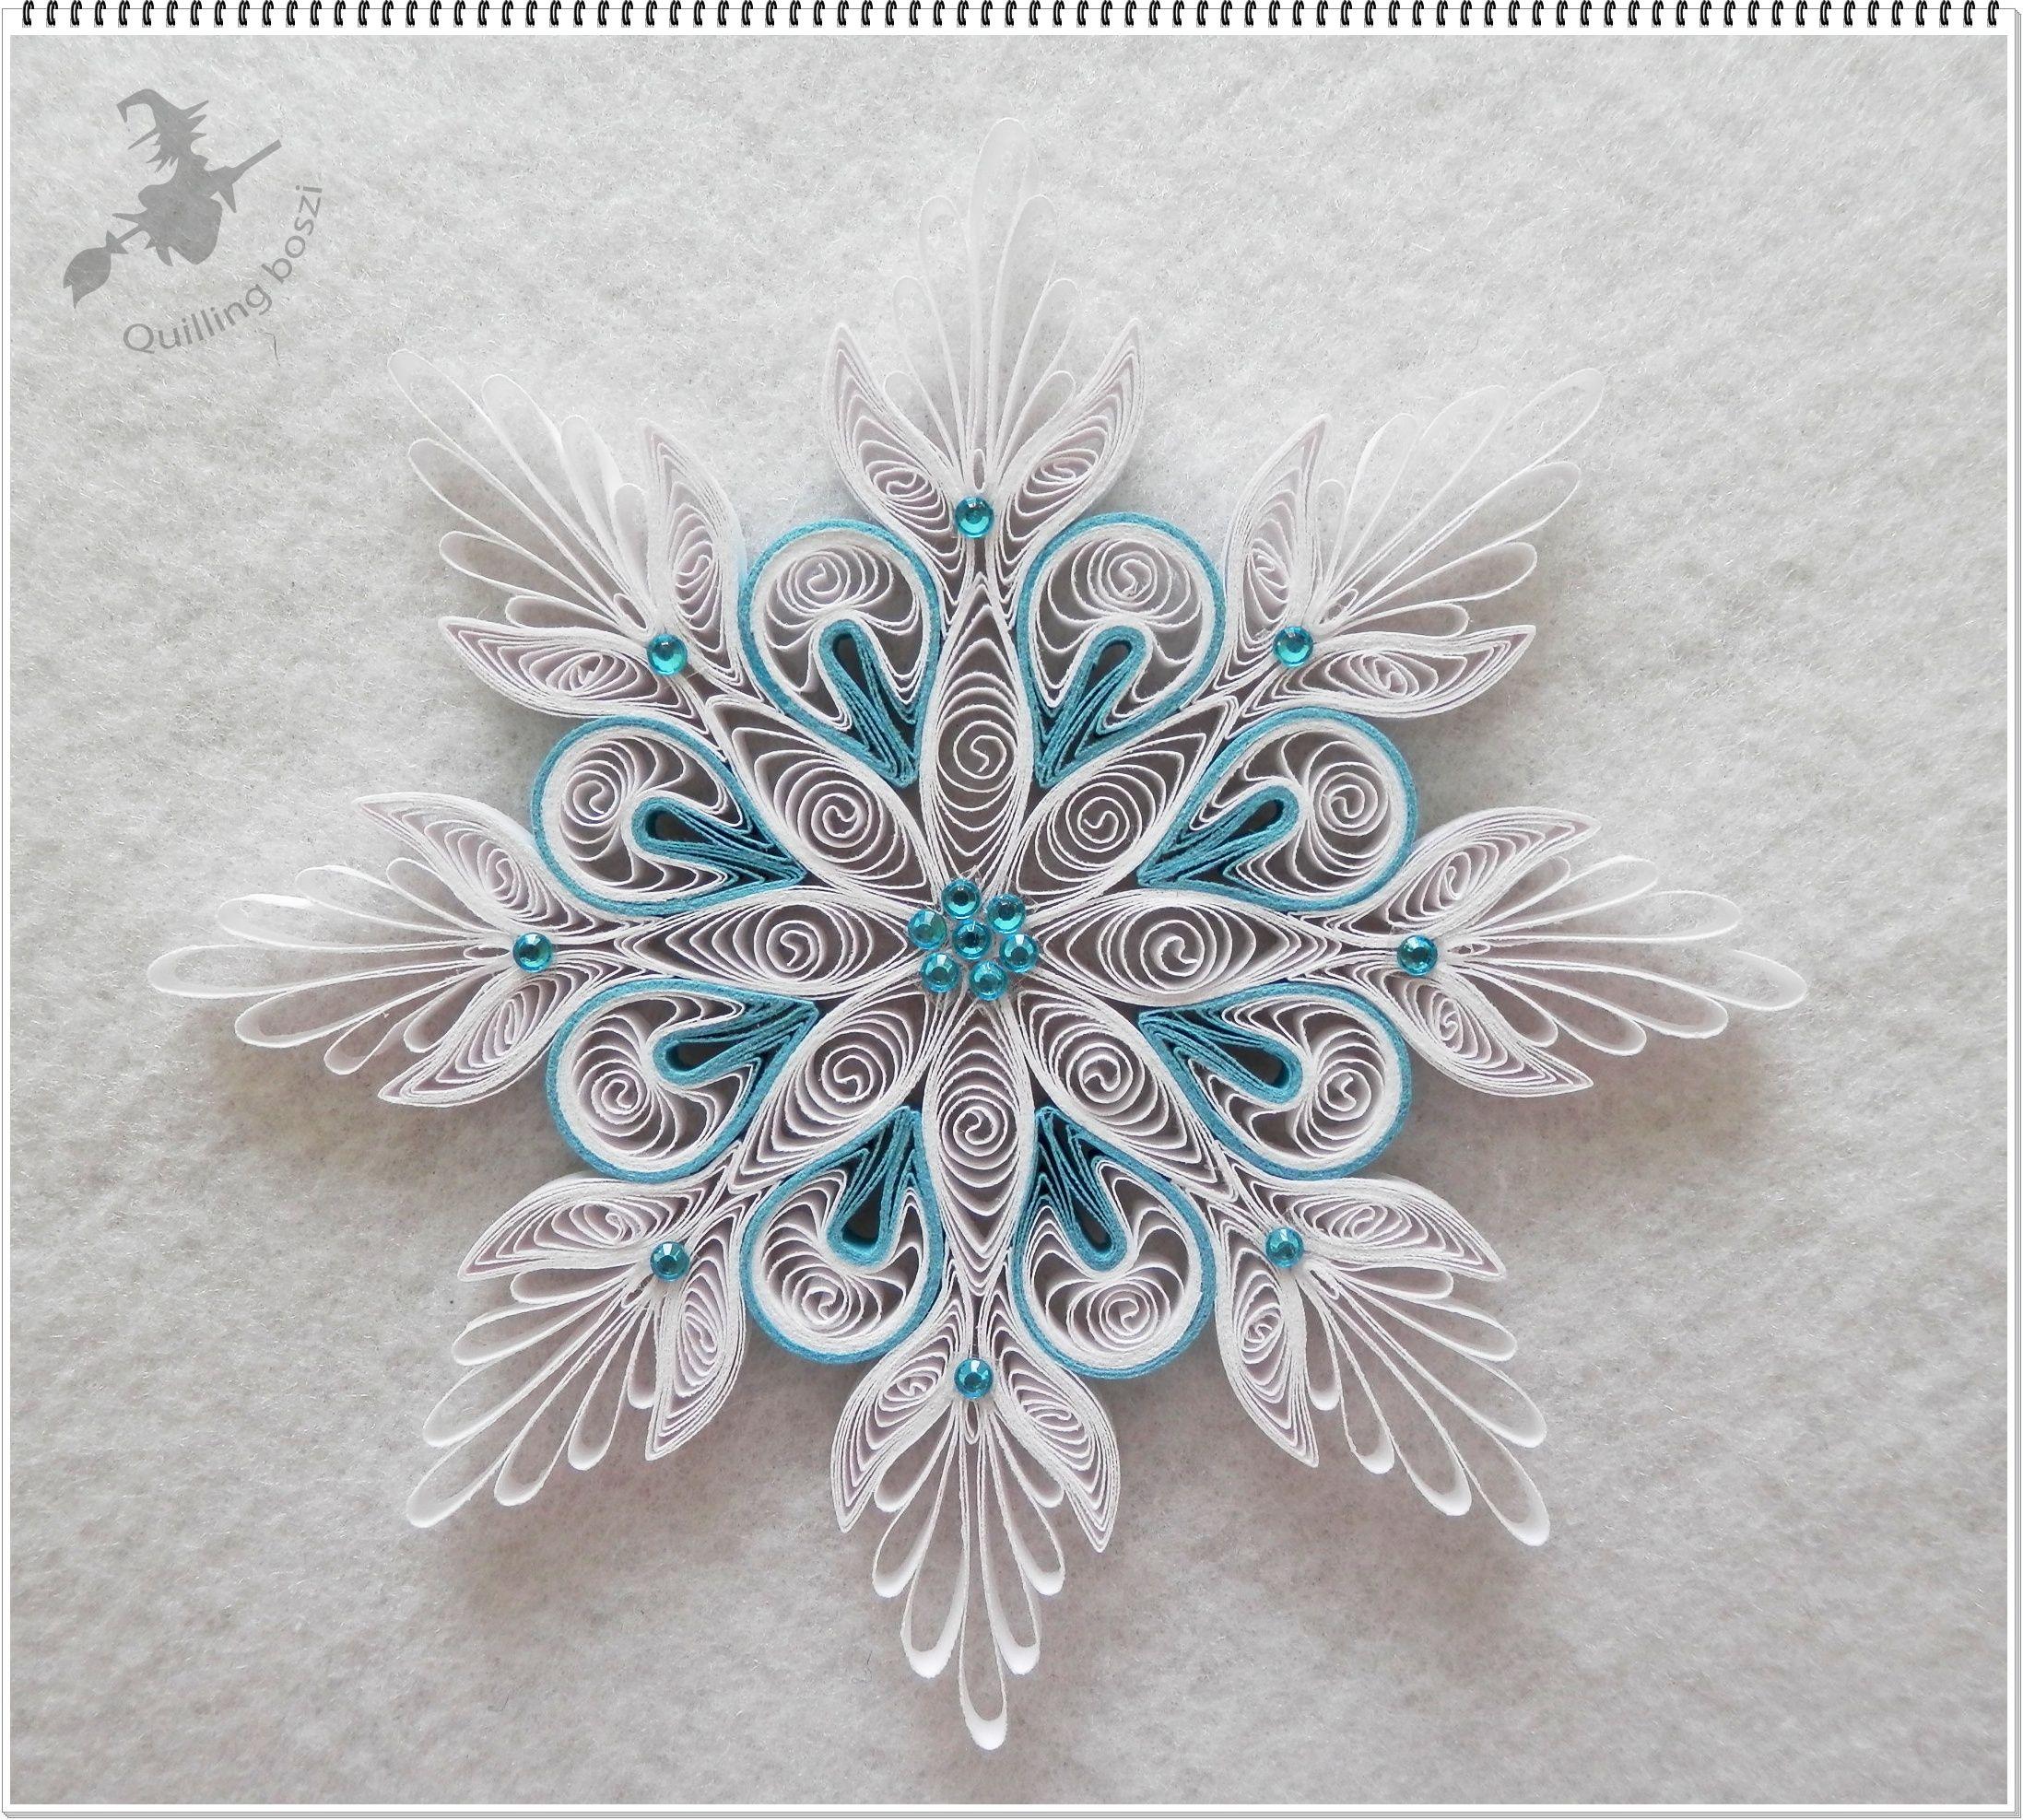 Kar csonyfa d sz quilling christmas pinterest for Quilling patterns